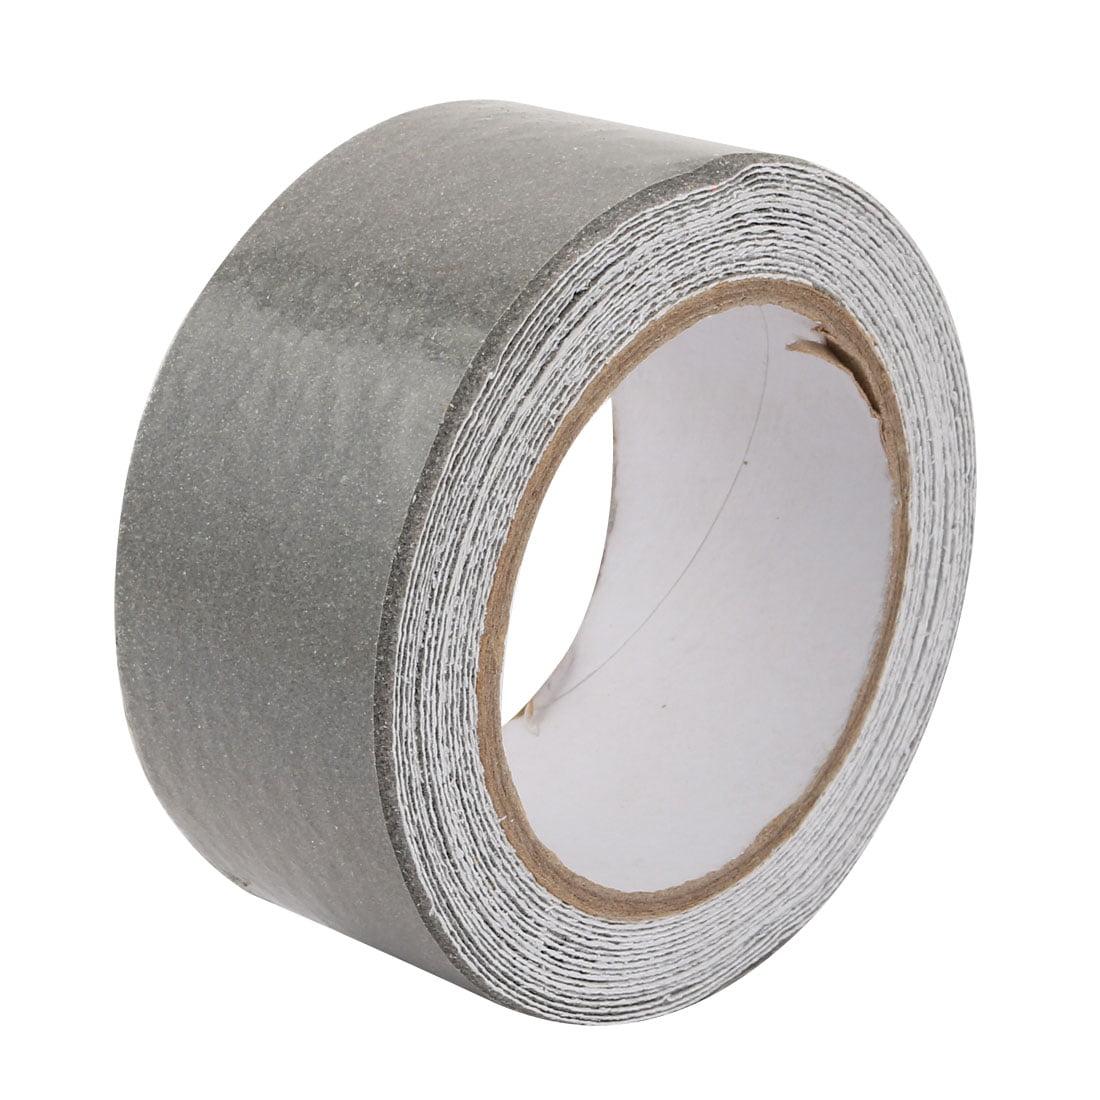 Unique Bargains 5M Long 5cm Width Adhesive Grit Anti Slip Tape for Stairs Floor Dark Gray - image 3 de 3